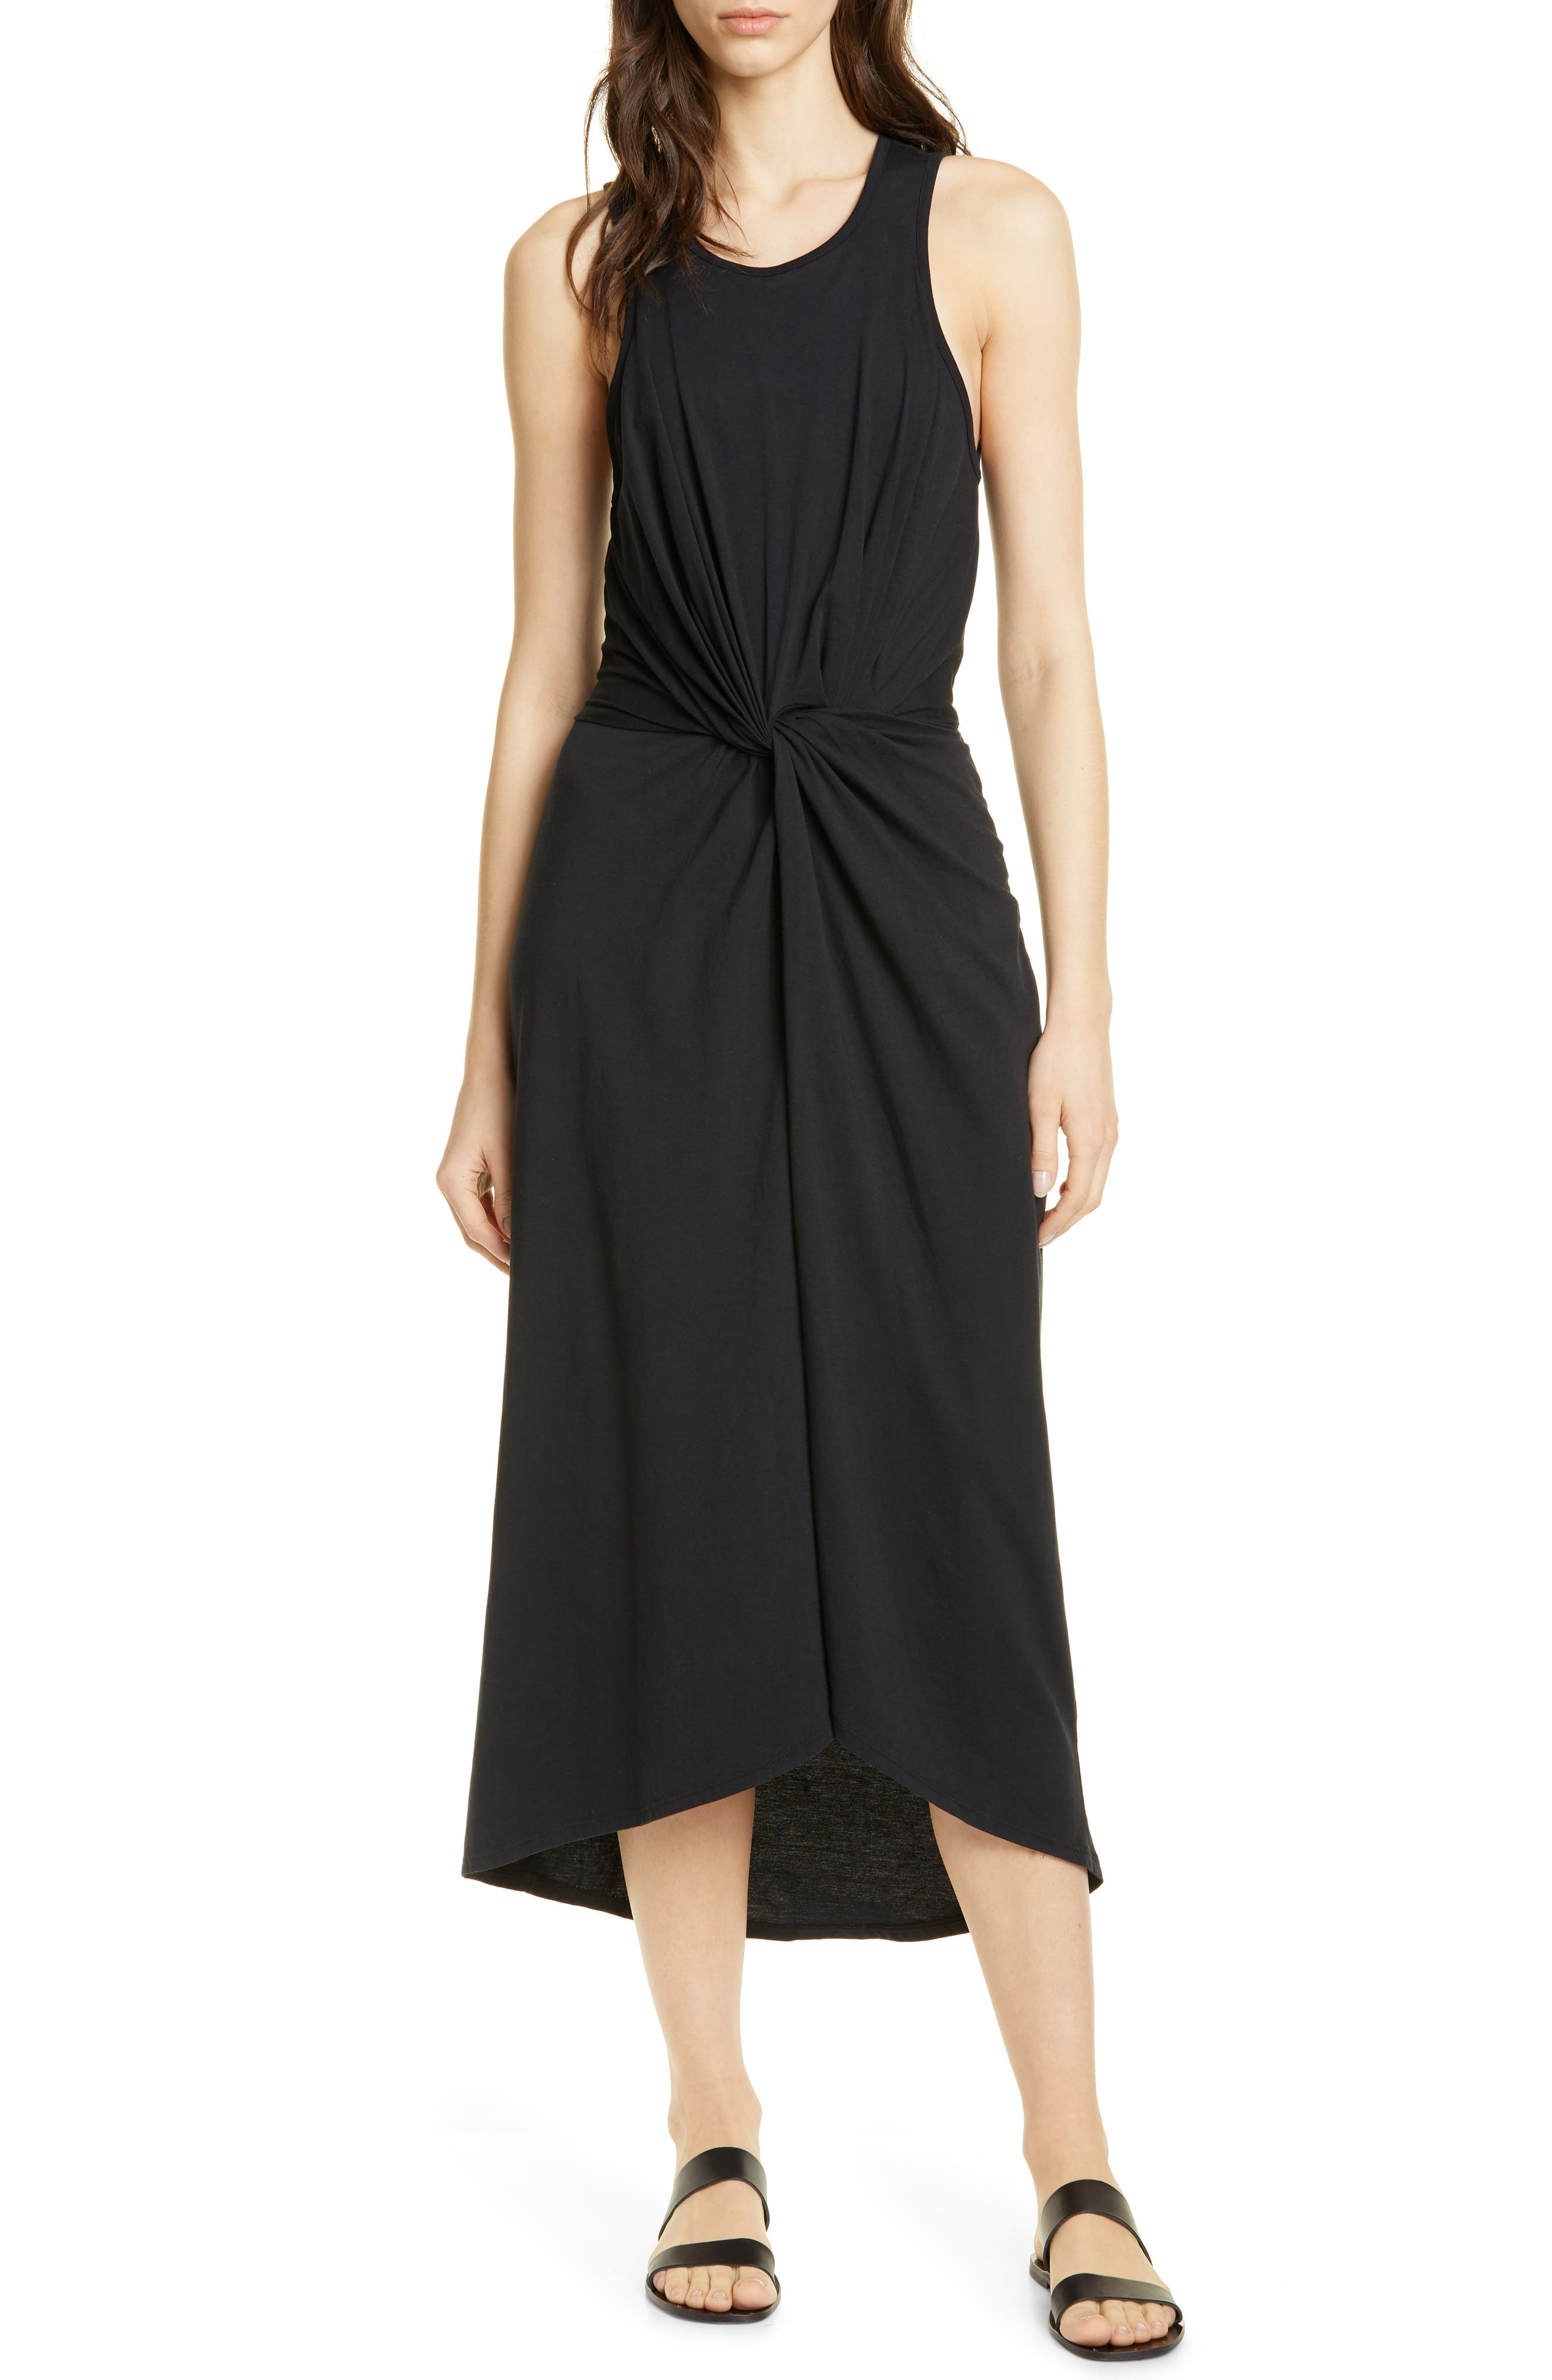 Joie Seamour Twist Front Midi Dress, Black